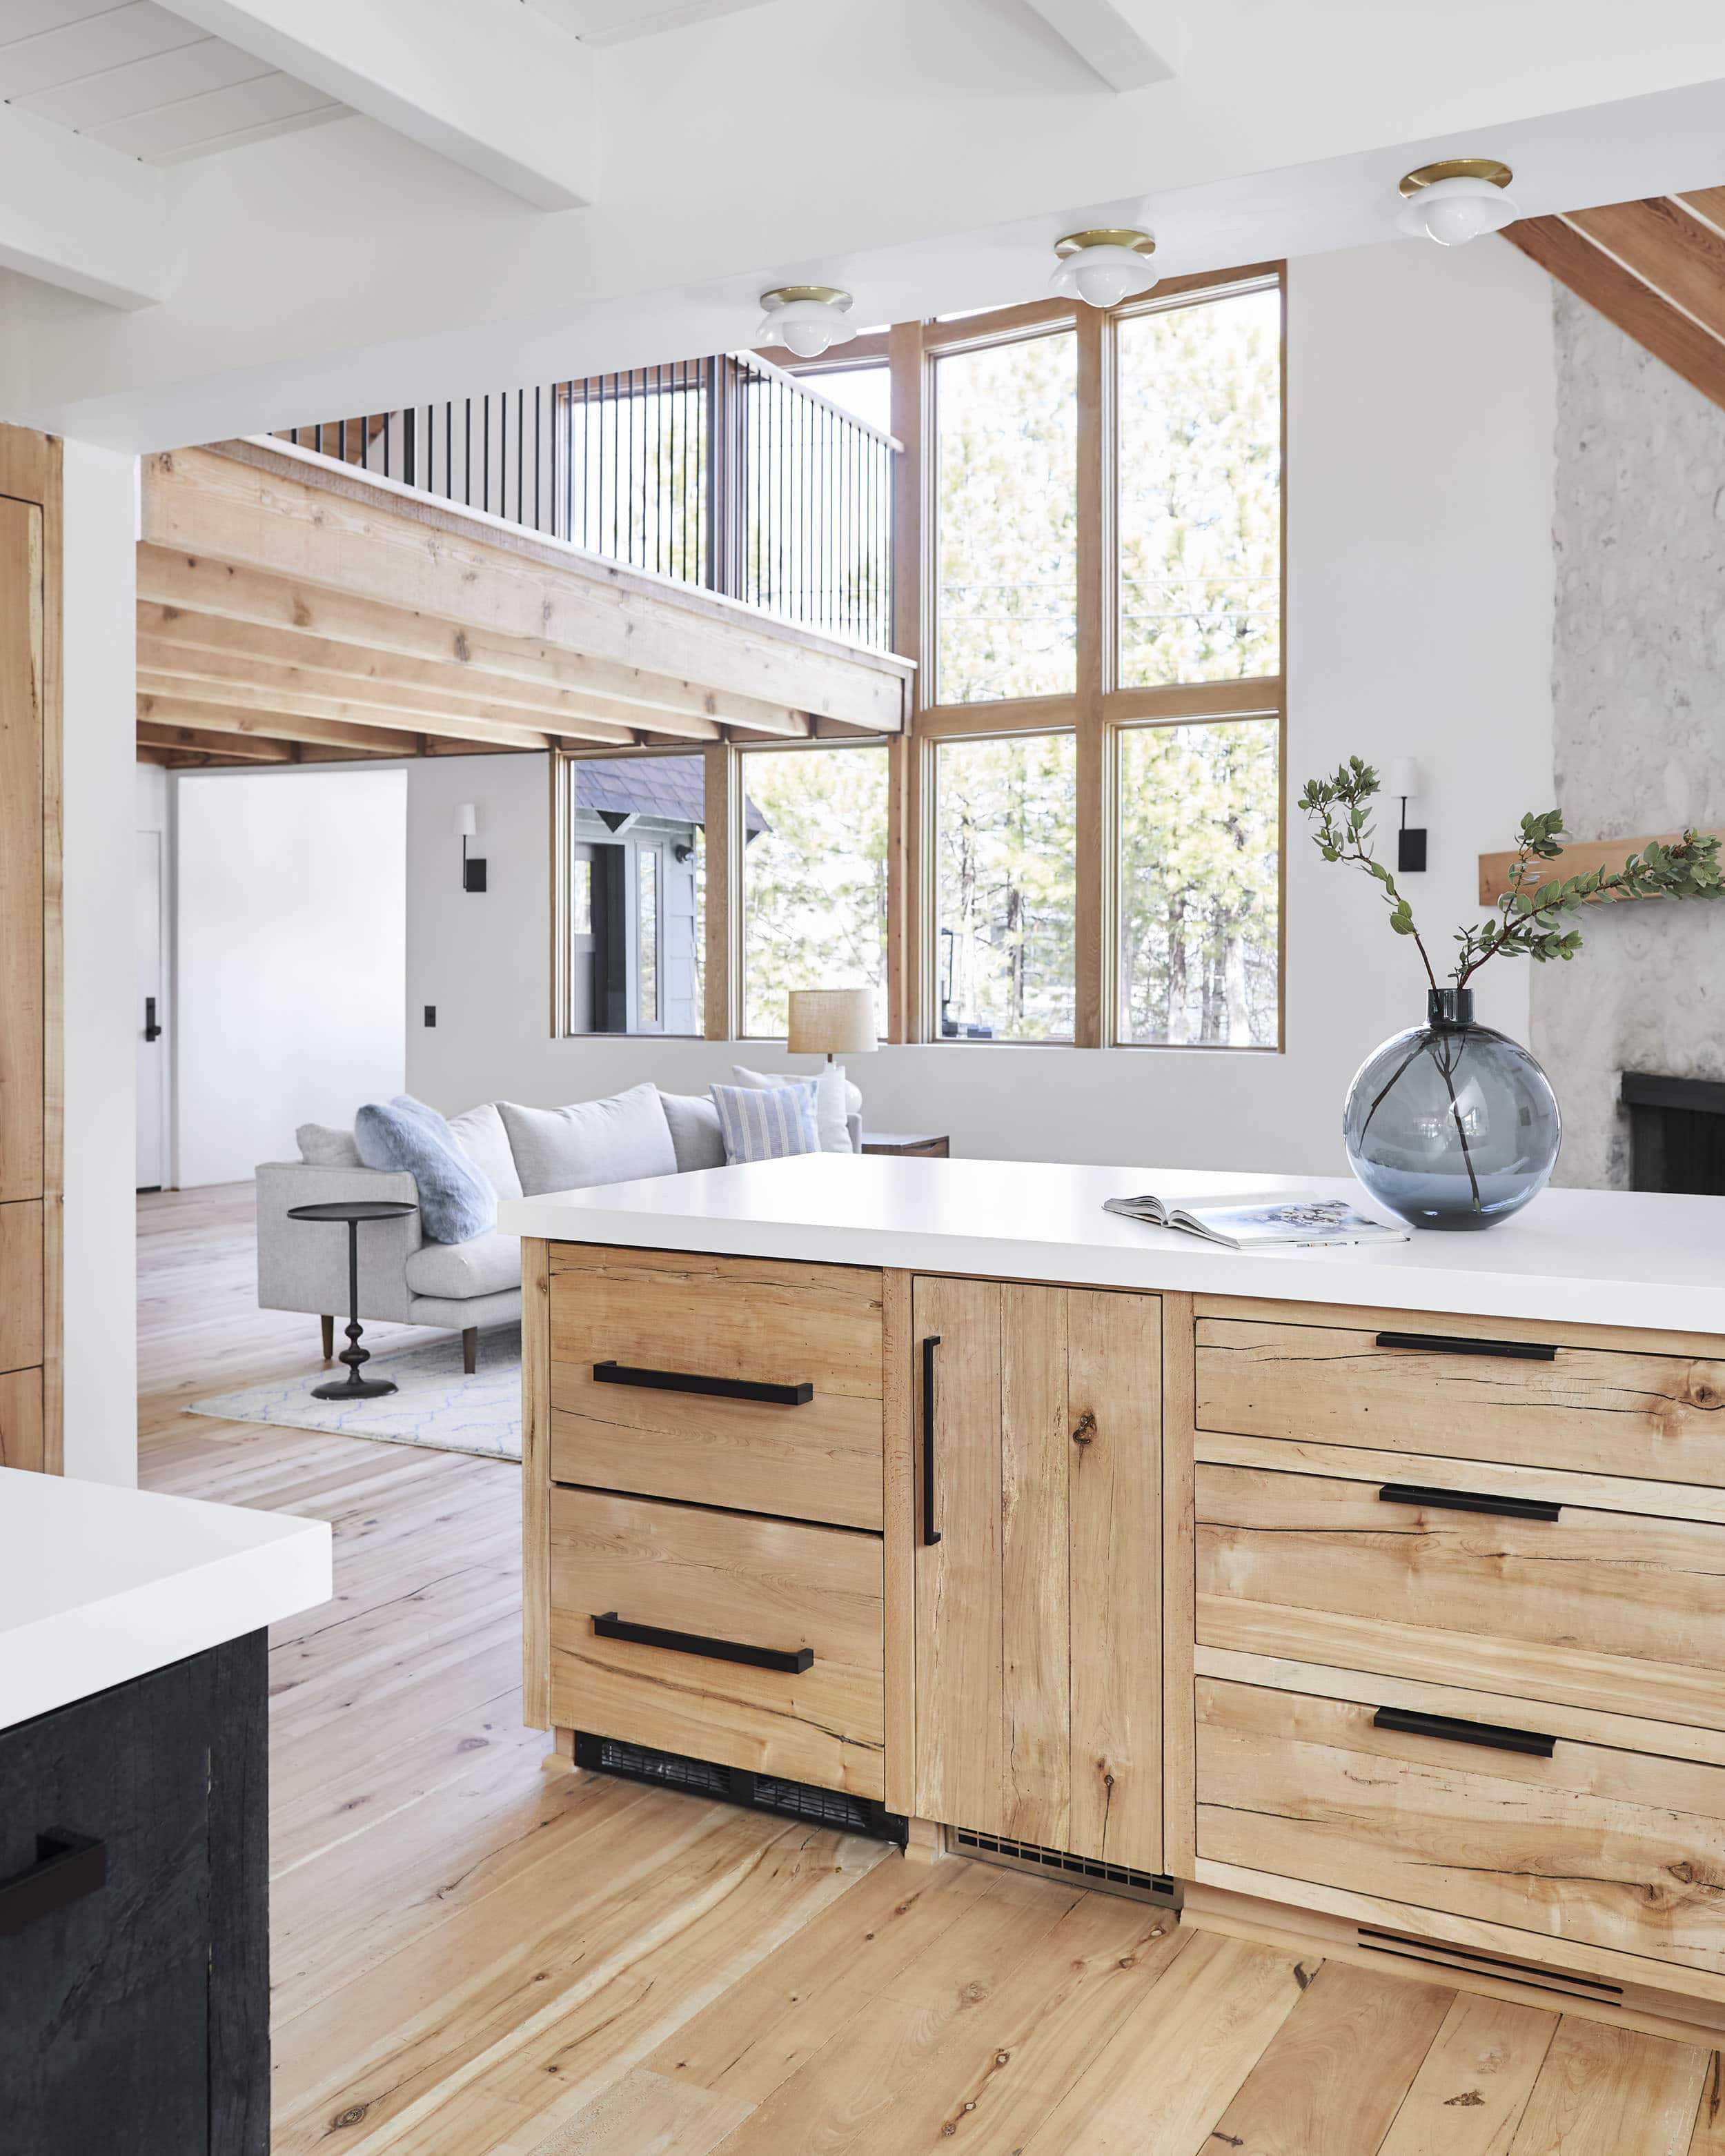 Emily Henderson Mountain House Scandinavian kitchen remodel_30